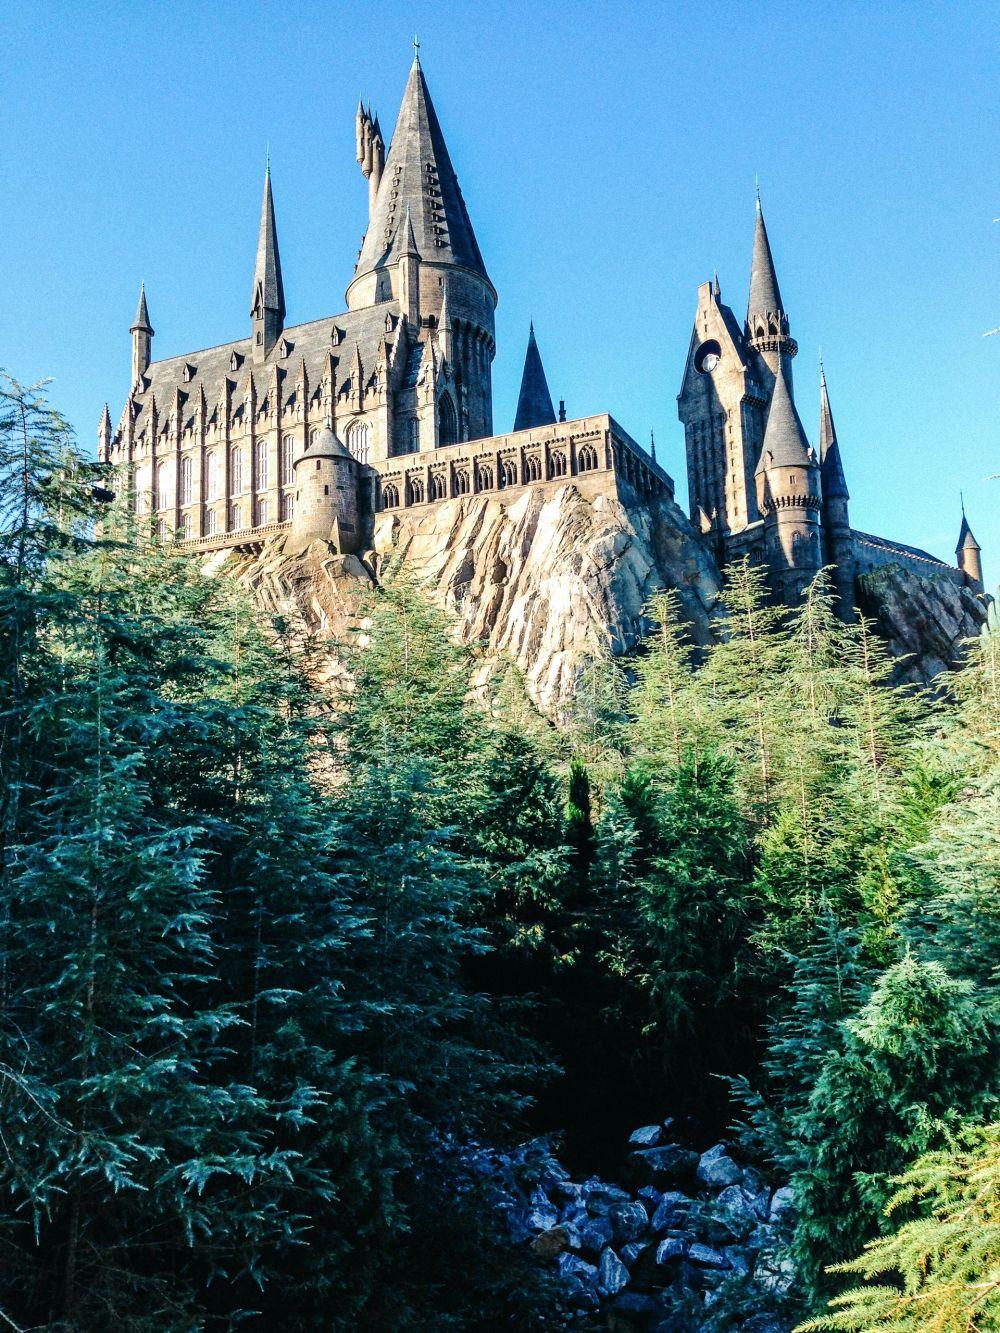 Universal Studios and Islands of Adventure in Orlando, Florida, USA (22)